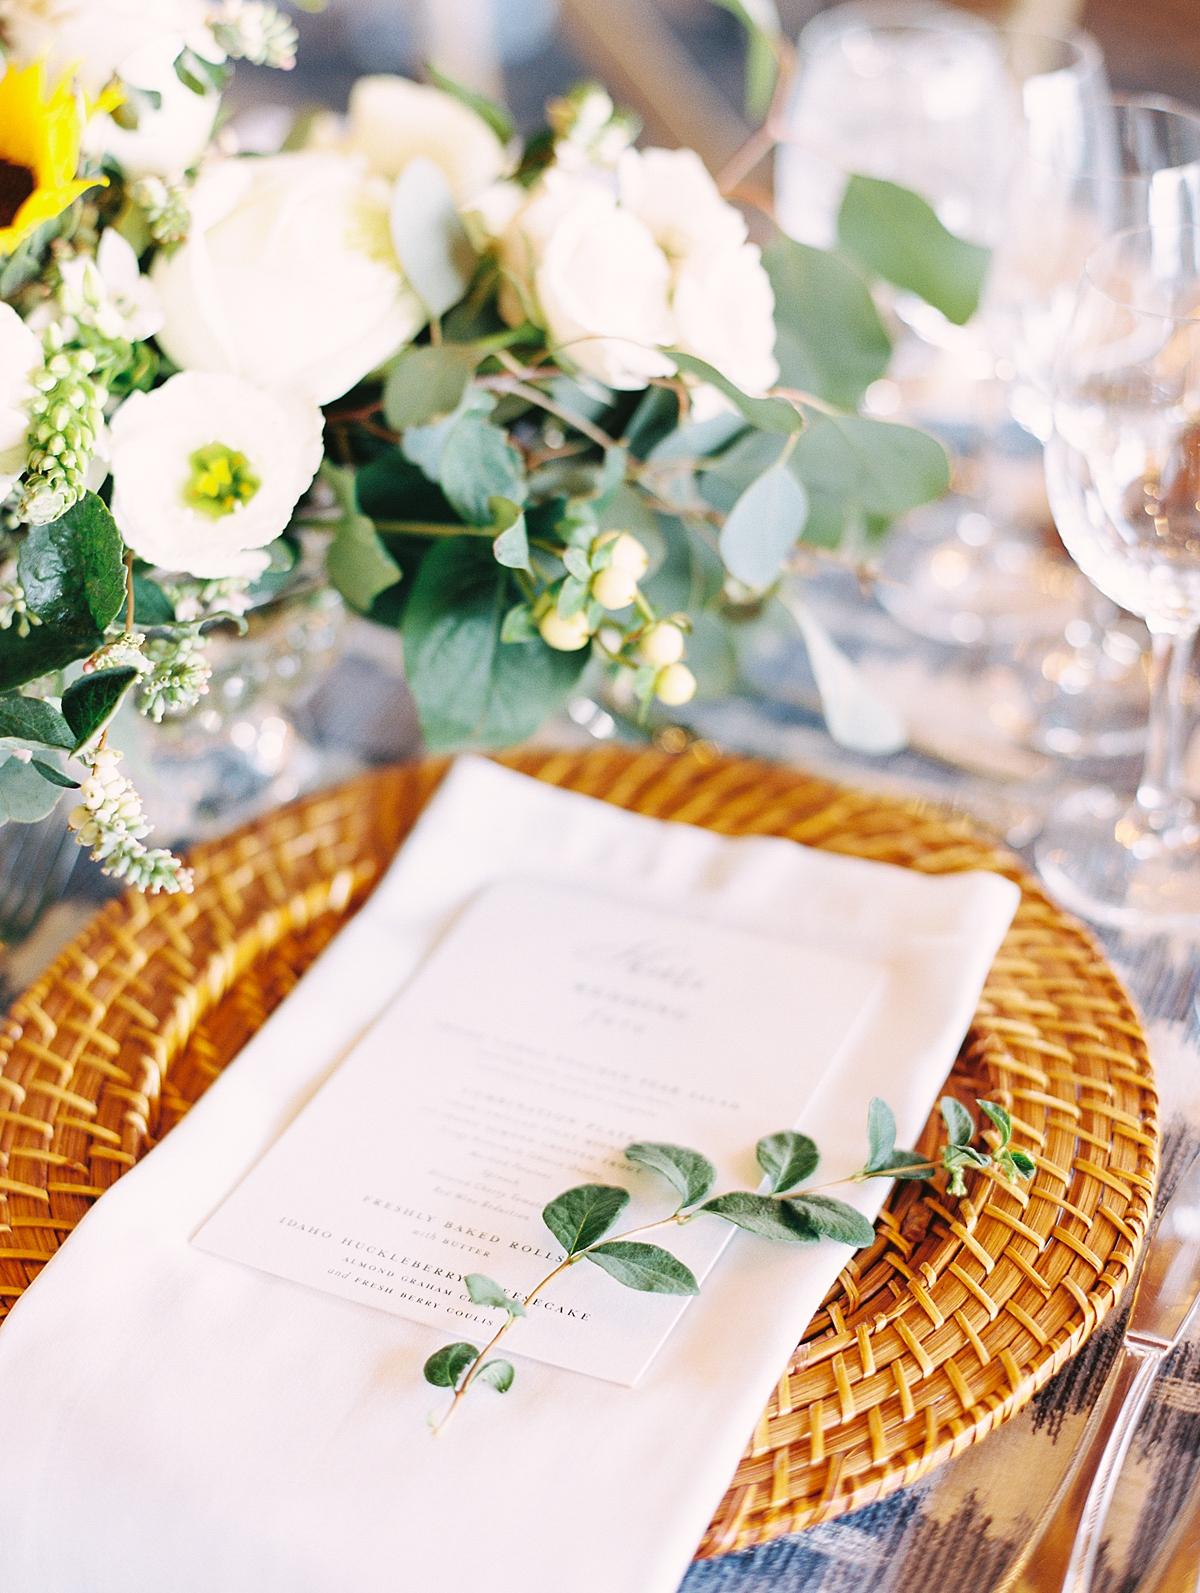 Ira and Lucy Wedding Planner, Idaho wedding planner, mccall wedding